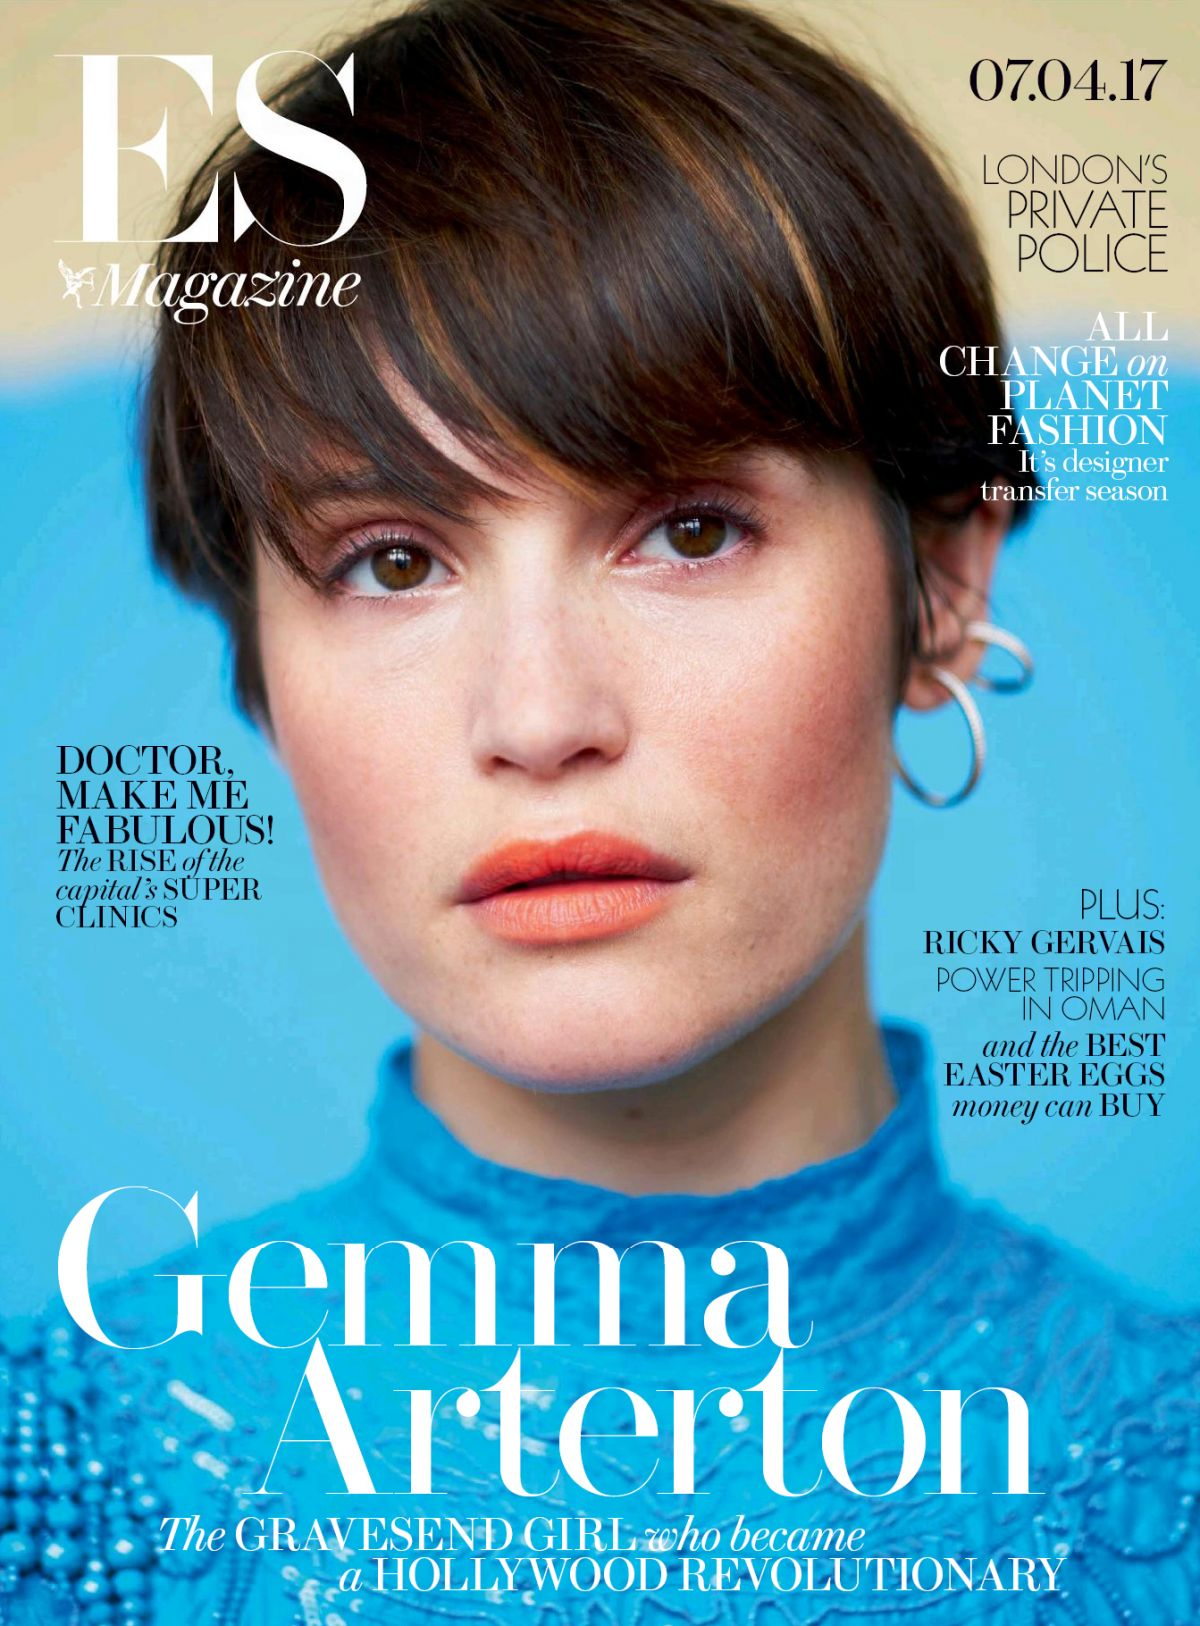 GEMMA ARTERTON for Evening Standard Magazine, April 2017